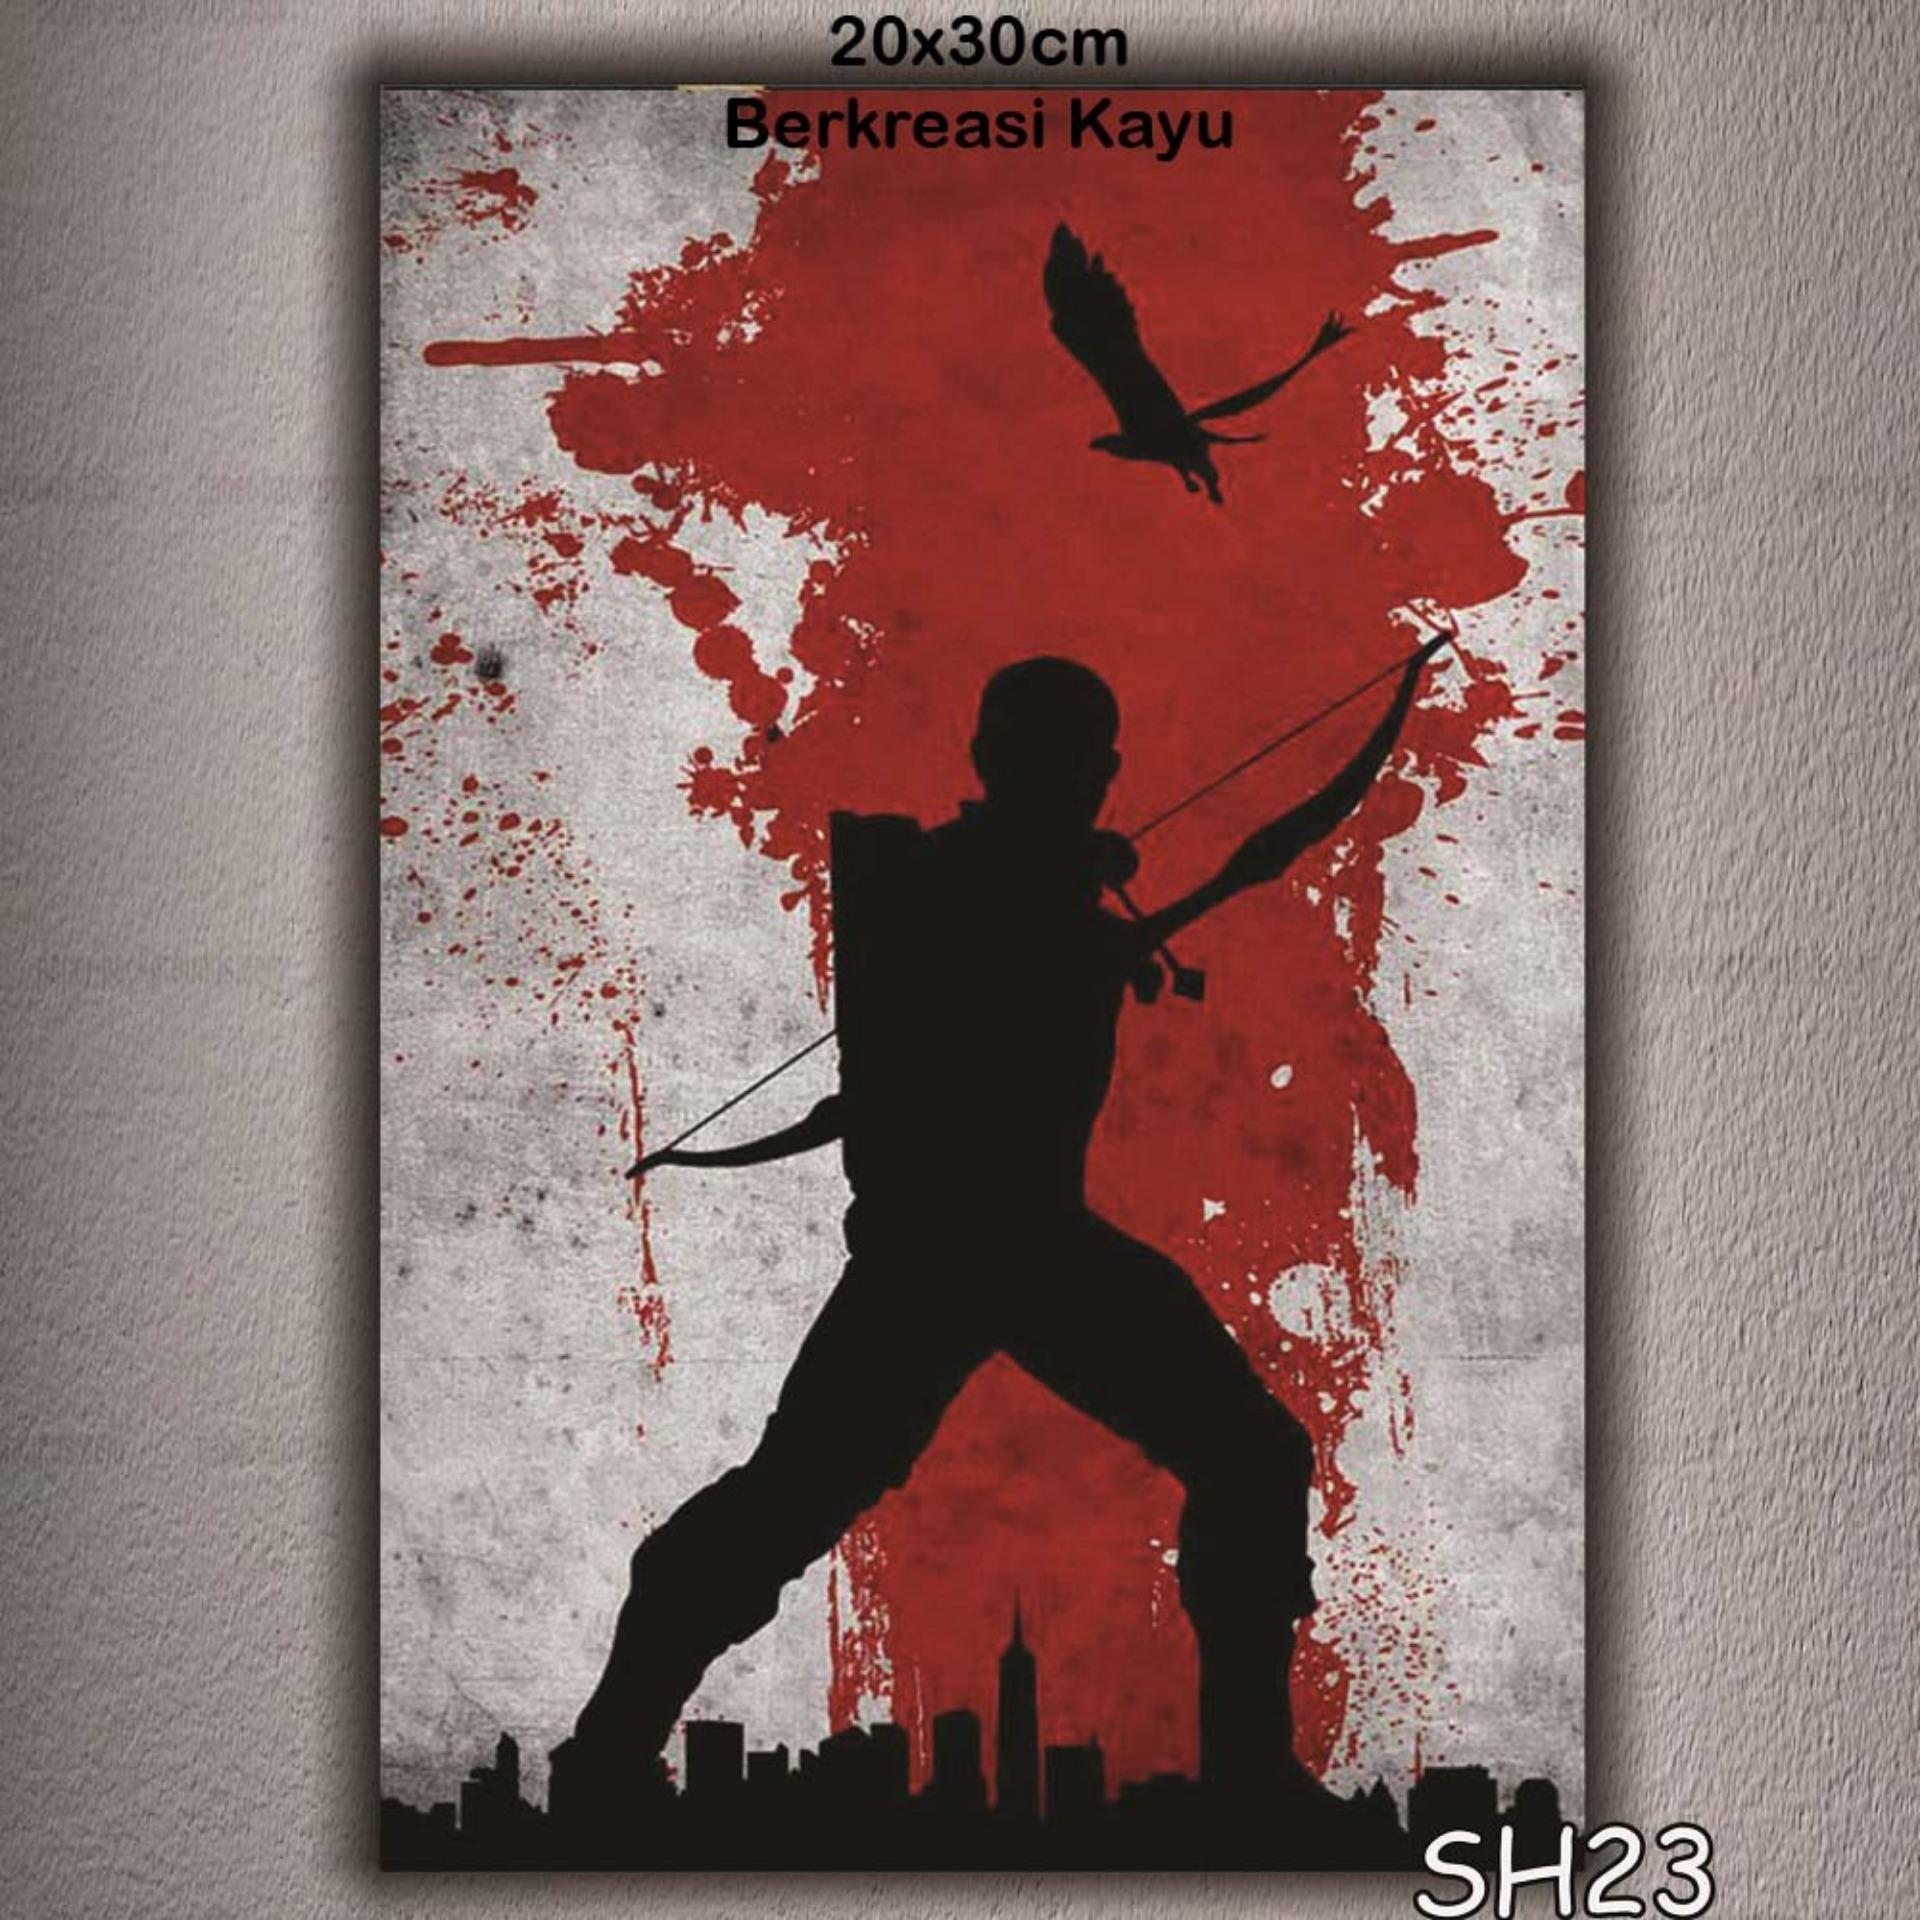 Vasty Hiasan Dinding Kayu Wall Decor Poster Super Hiro VSH-23